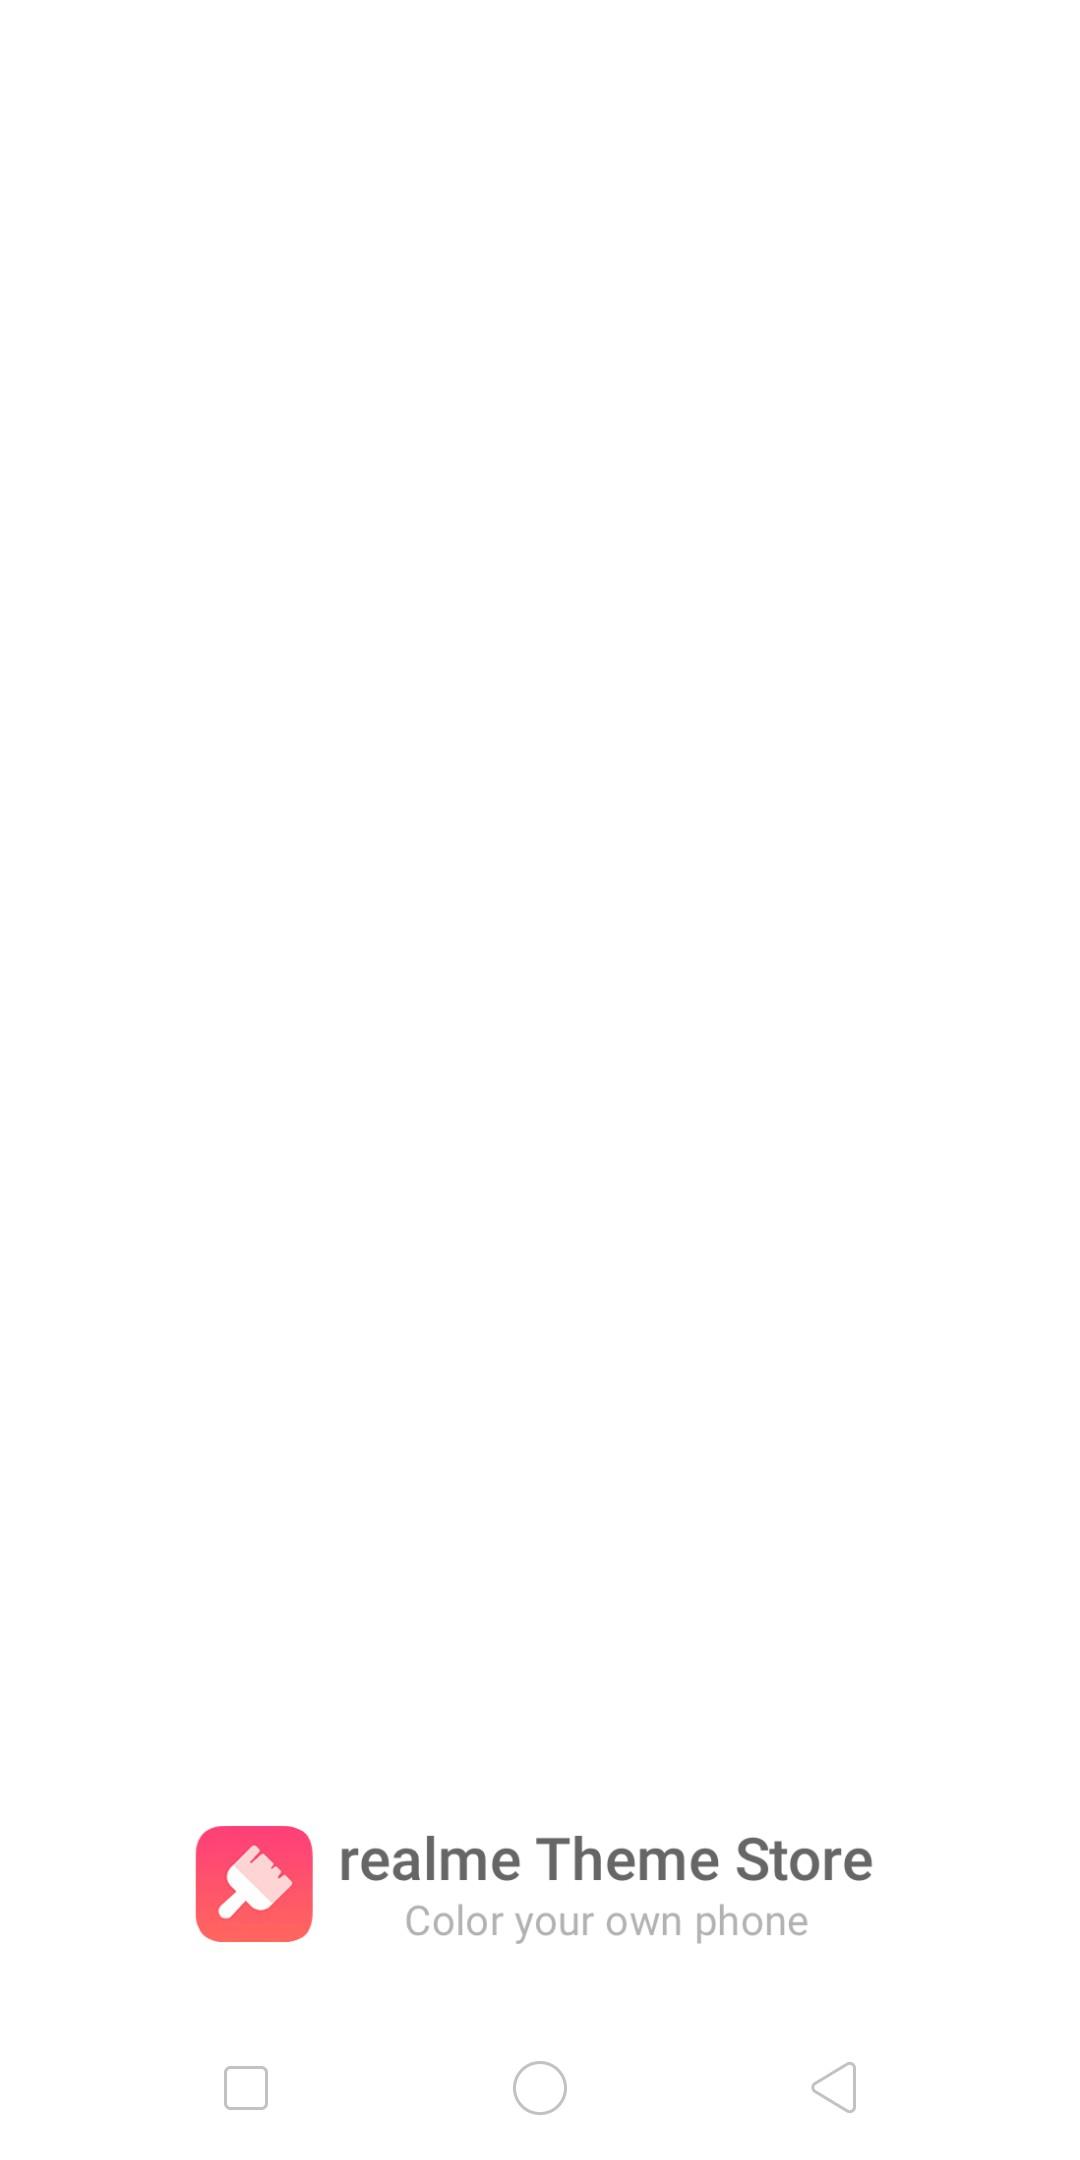 Realme Theme Store - Beta Download